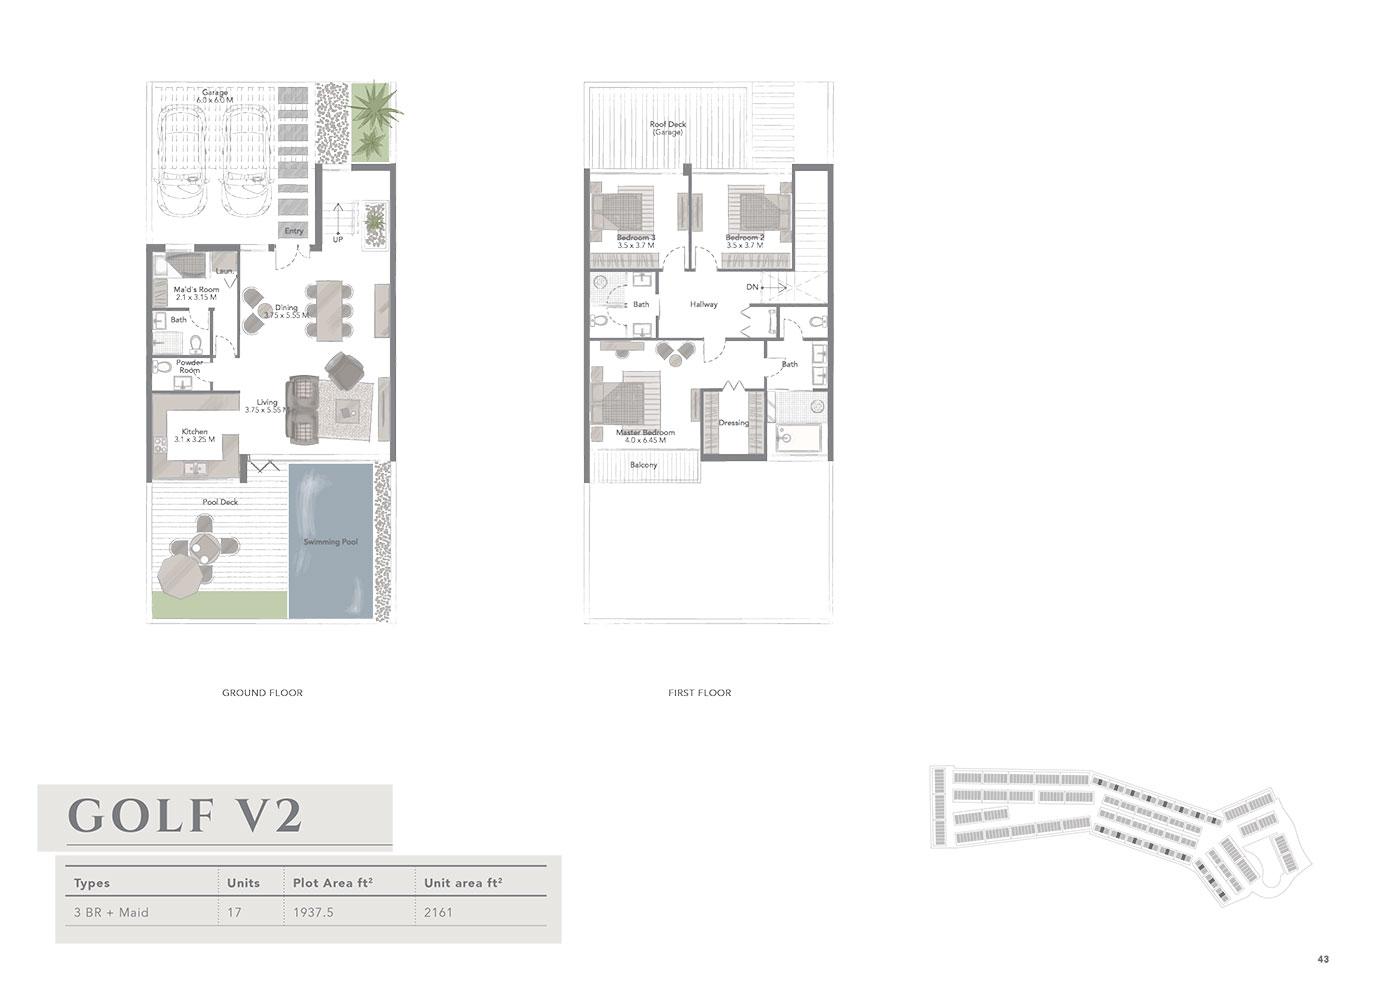 3 Bedroom +Maid, Golf V2, Size 2161 sq ft